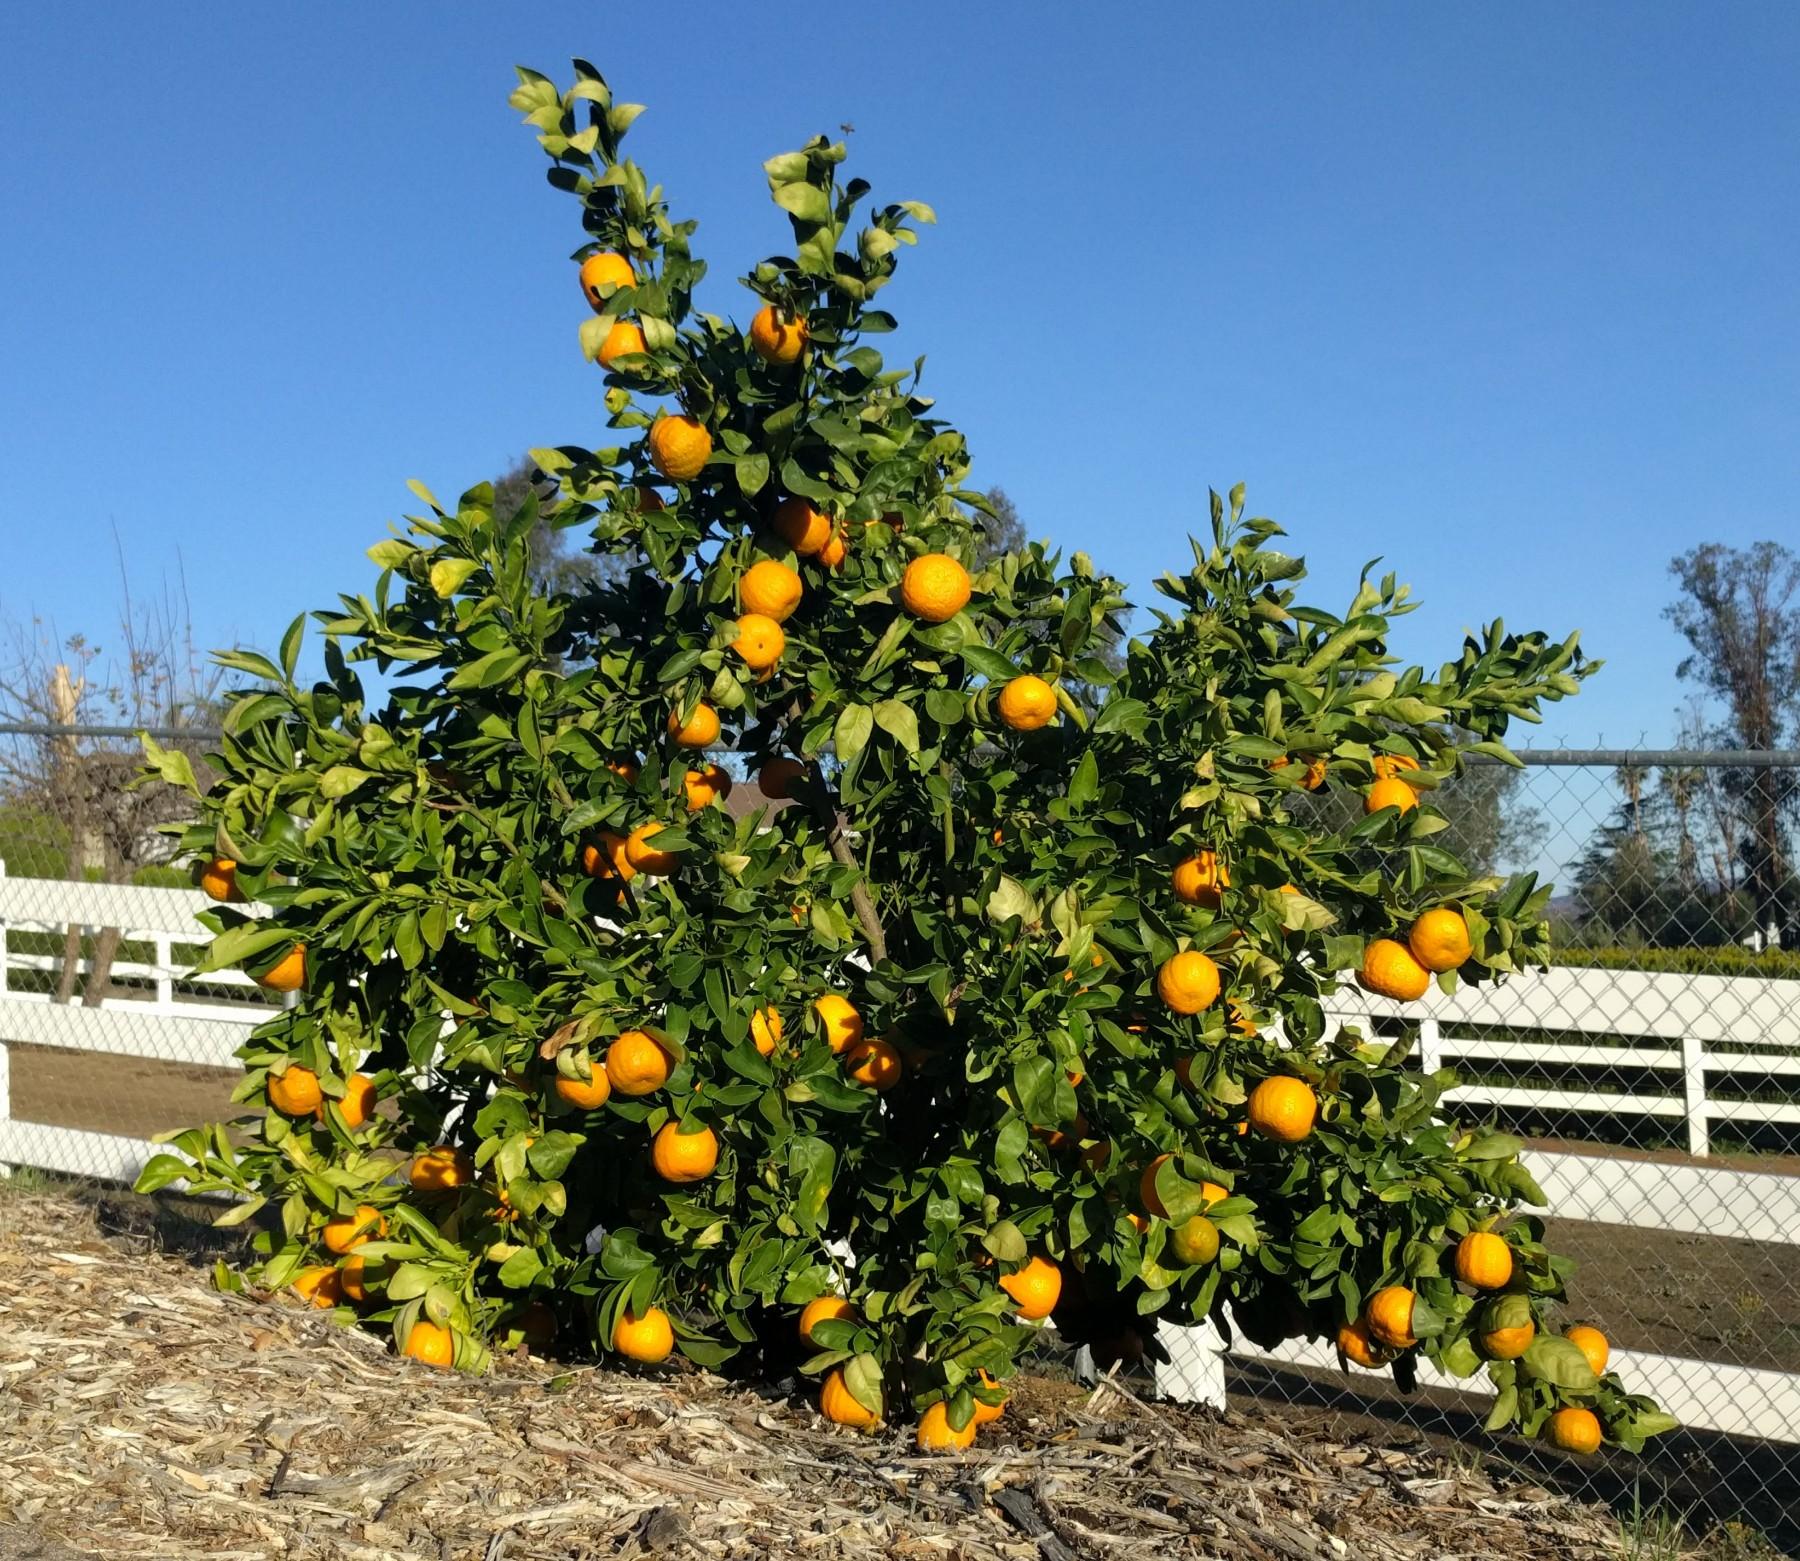 When to pick oranges and tangerines - Greg Alder's Yard